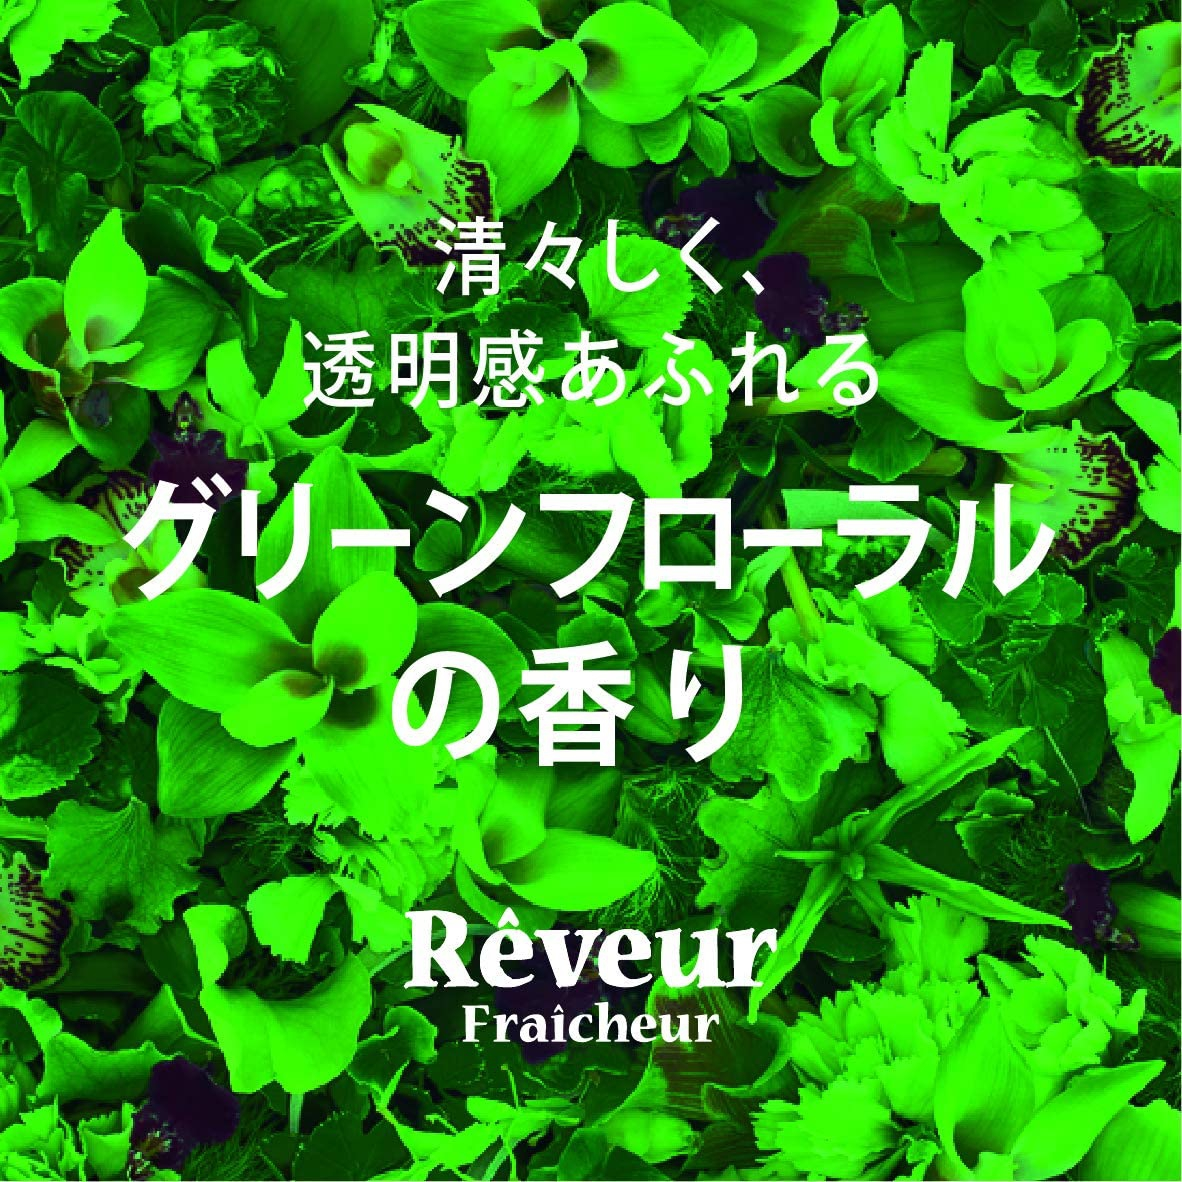 Rêveur(レヴール) フレッシュール リペア シャンプーの商品画像5